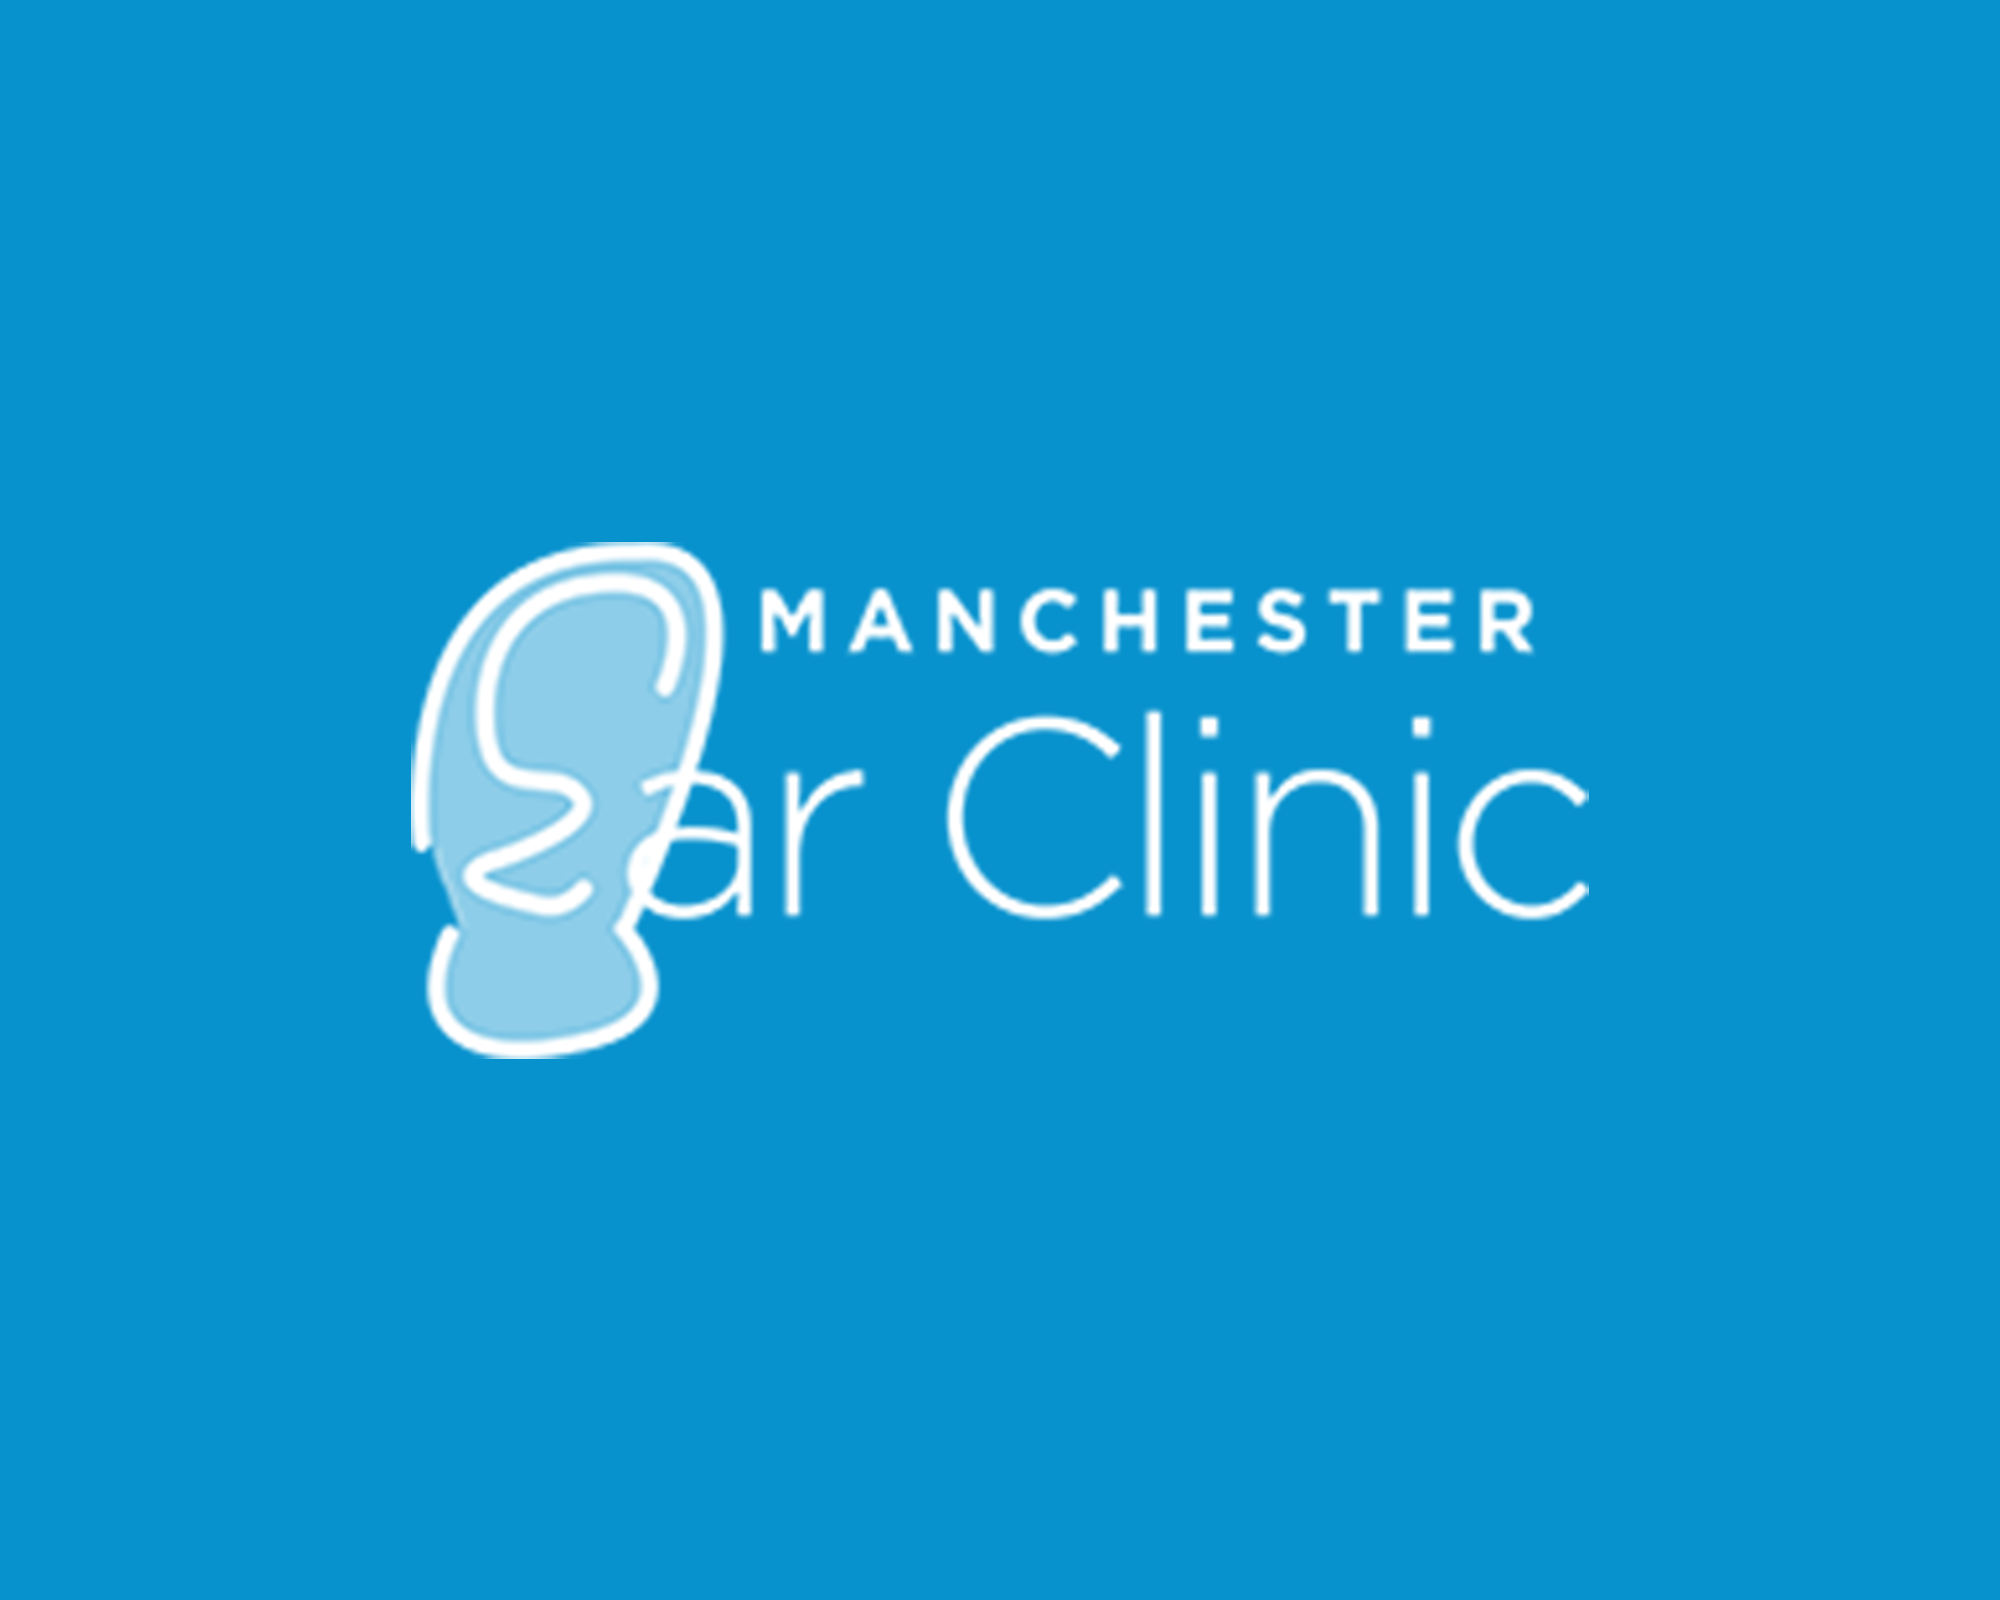 manchester ear clinic Logo